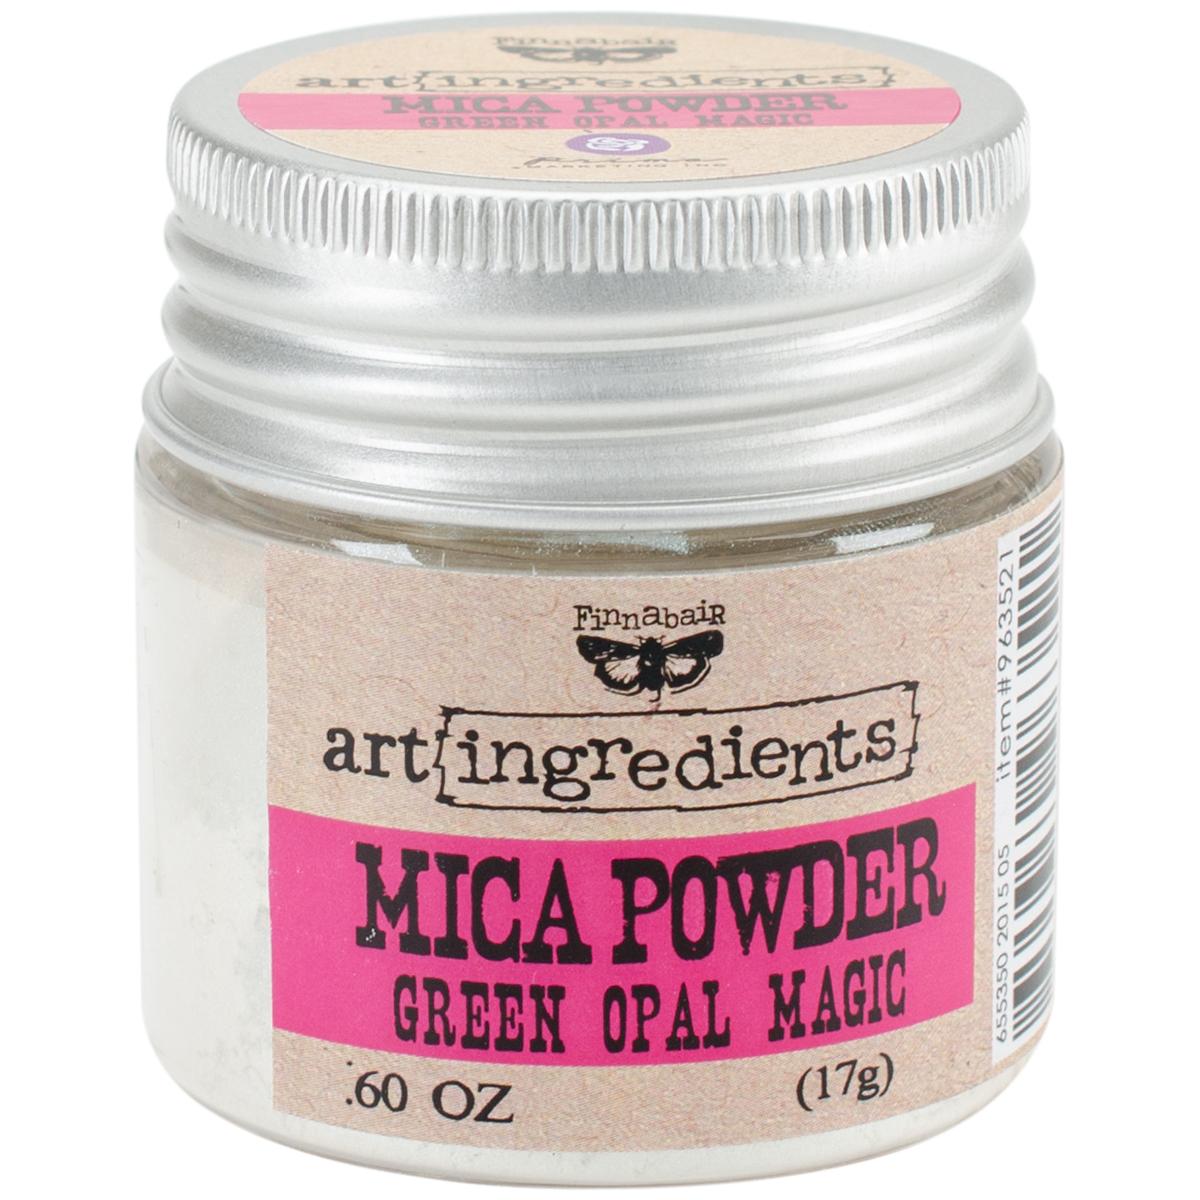 Mica Powder - Green Opal